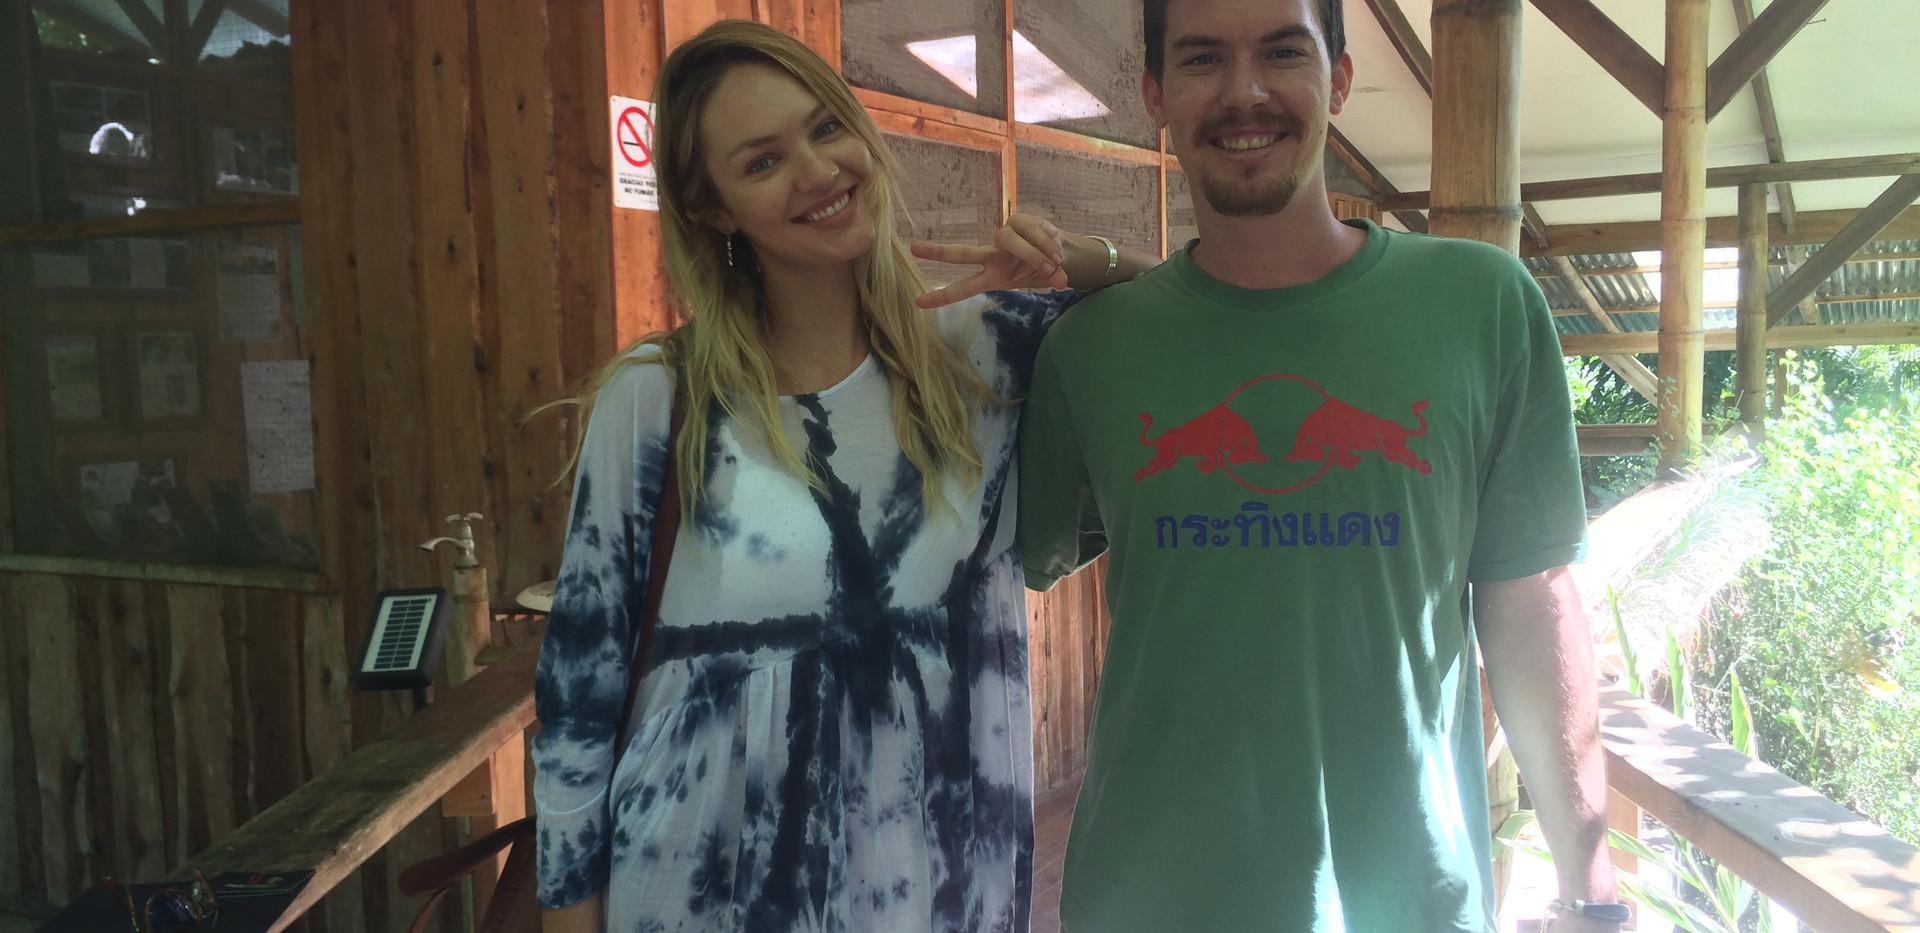 Matt and Candice Swanepoel